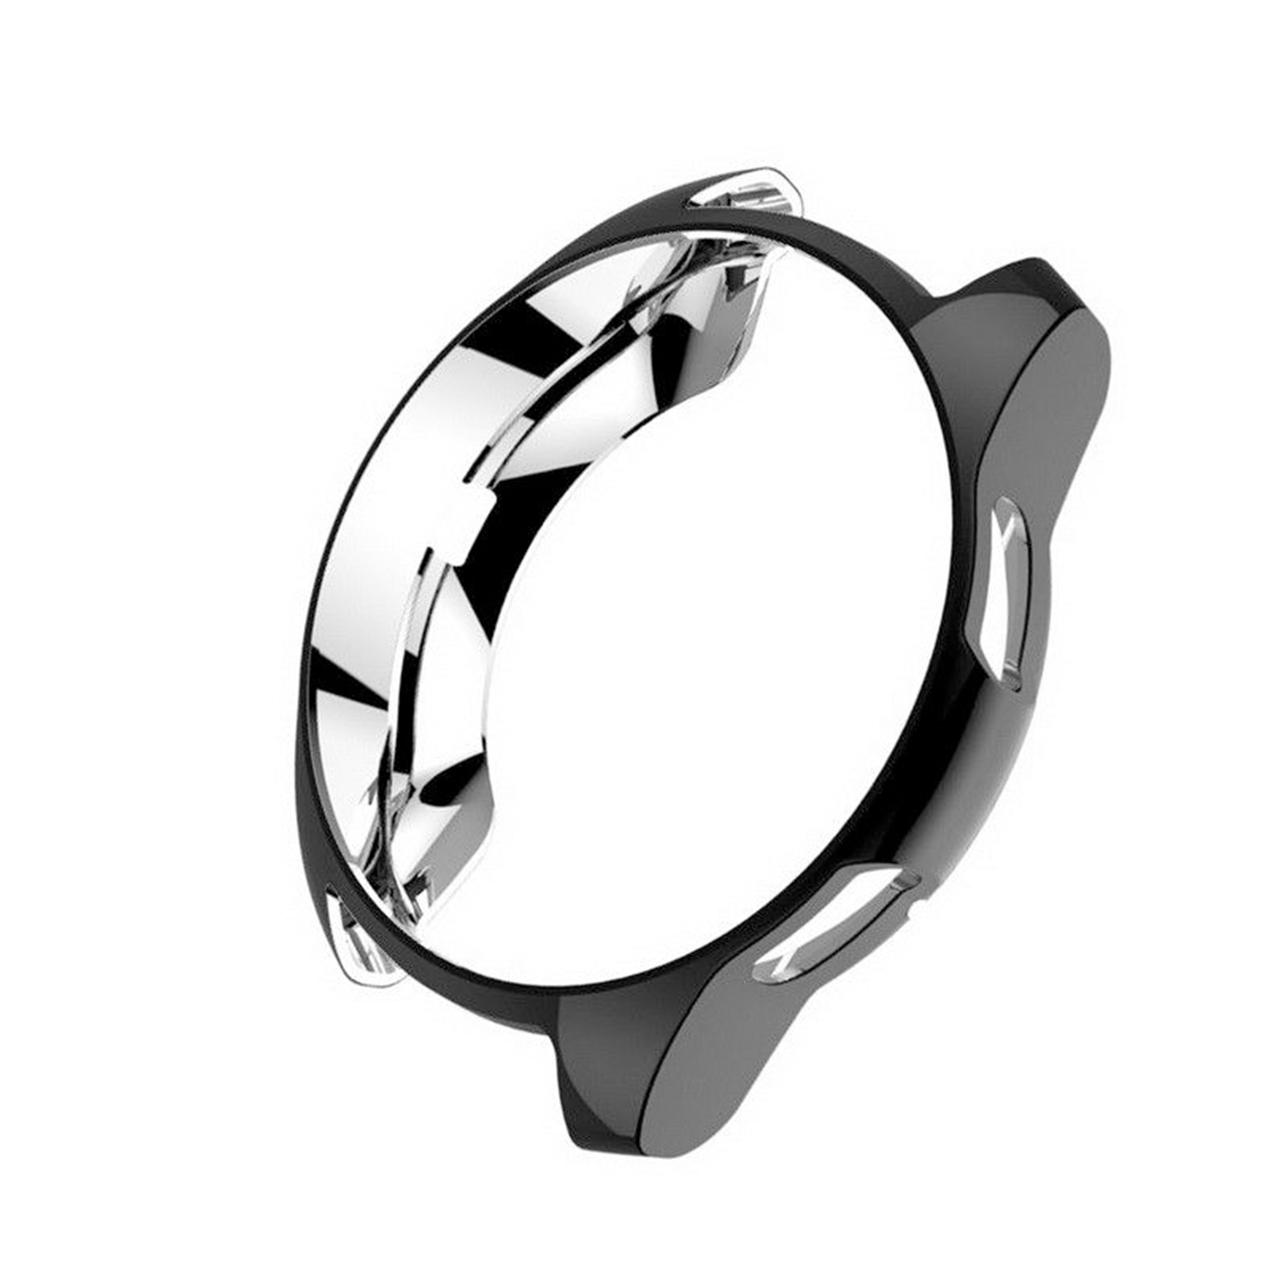 کاور مدل T-G42 مناسب برای ساعت هوشمند سامسونگ Galaxy Watch 42mm